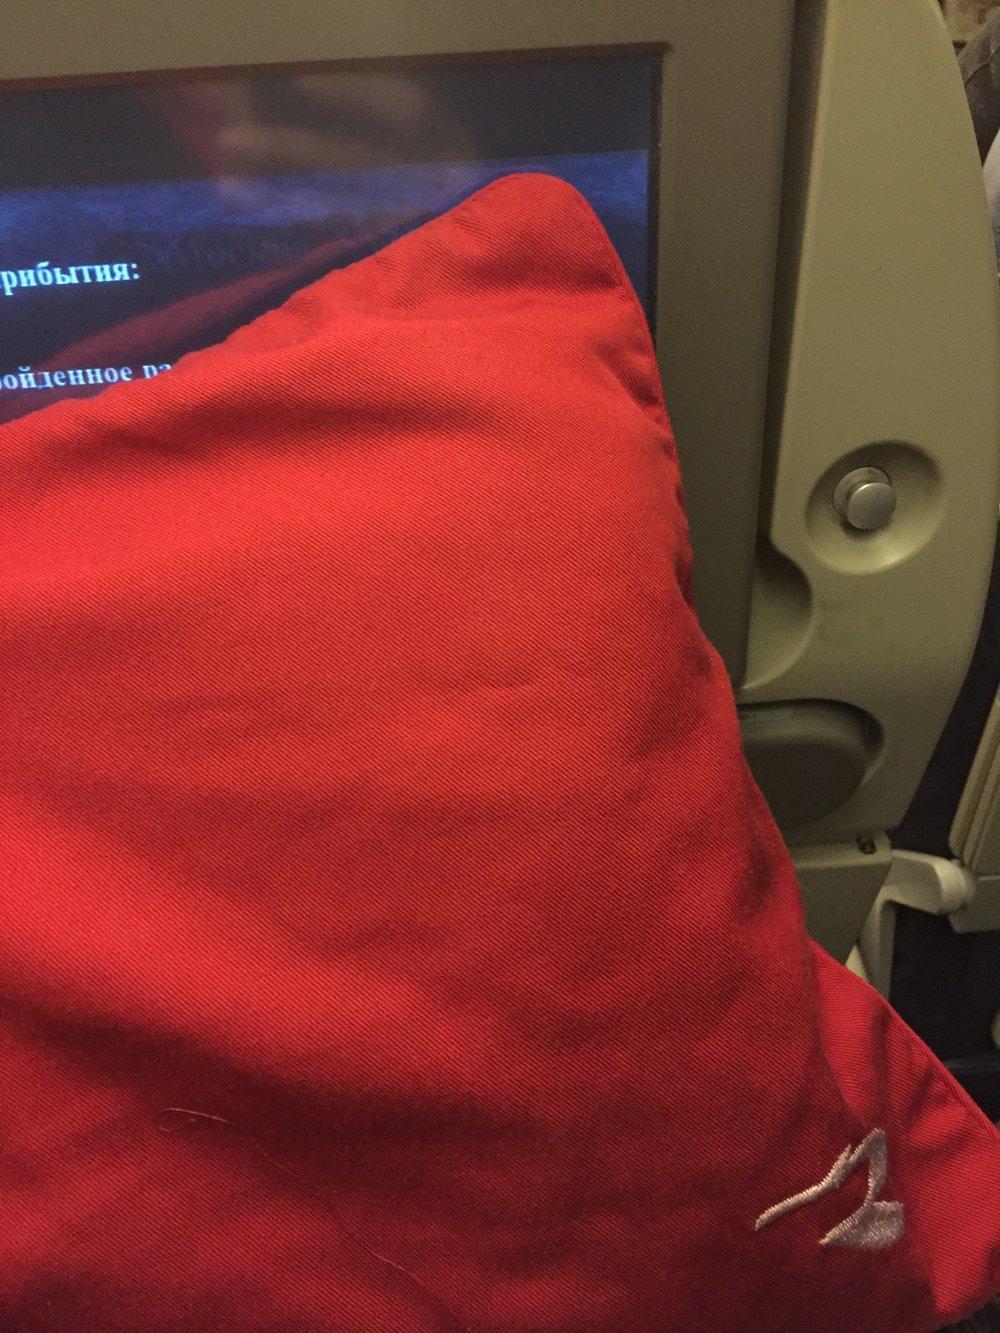 rossiya airlines pillow.JPG